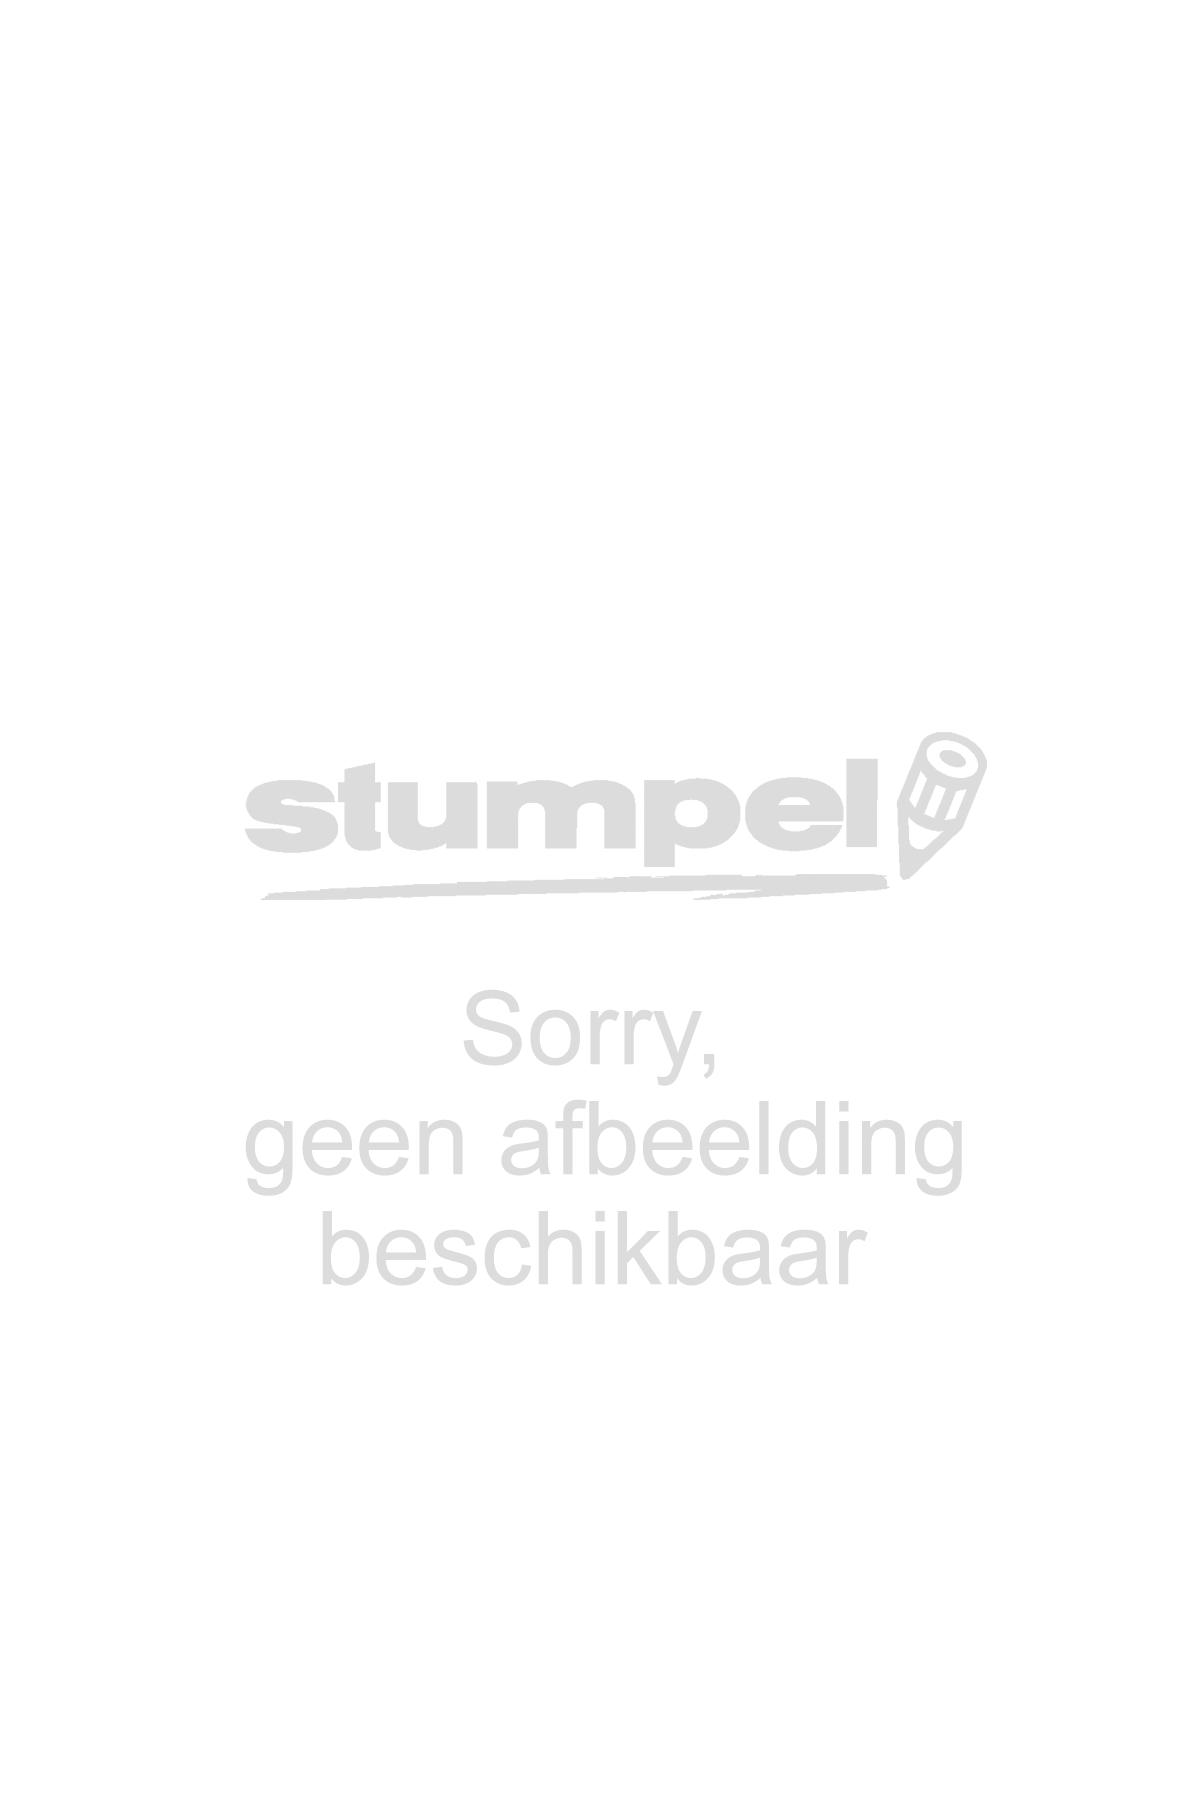 Balpen Waterman Hemisphere Stainless steel GT